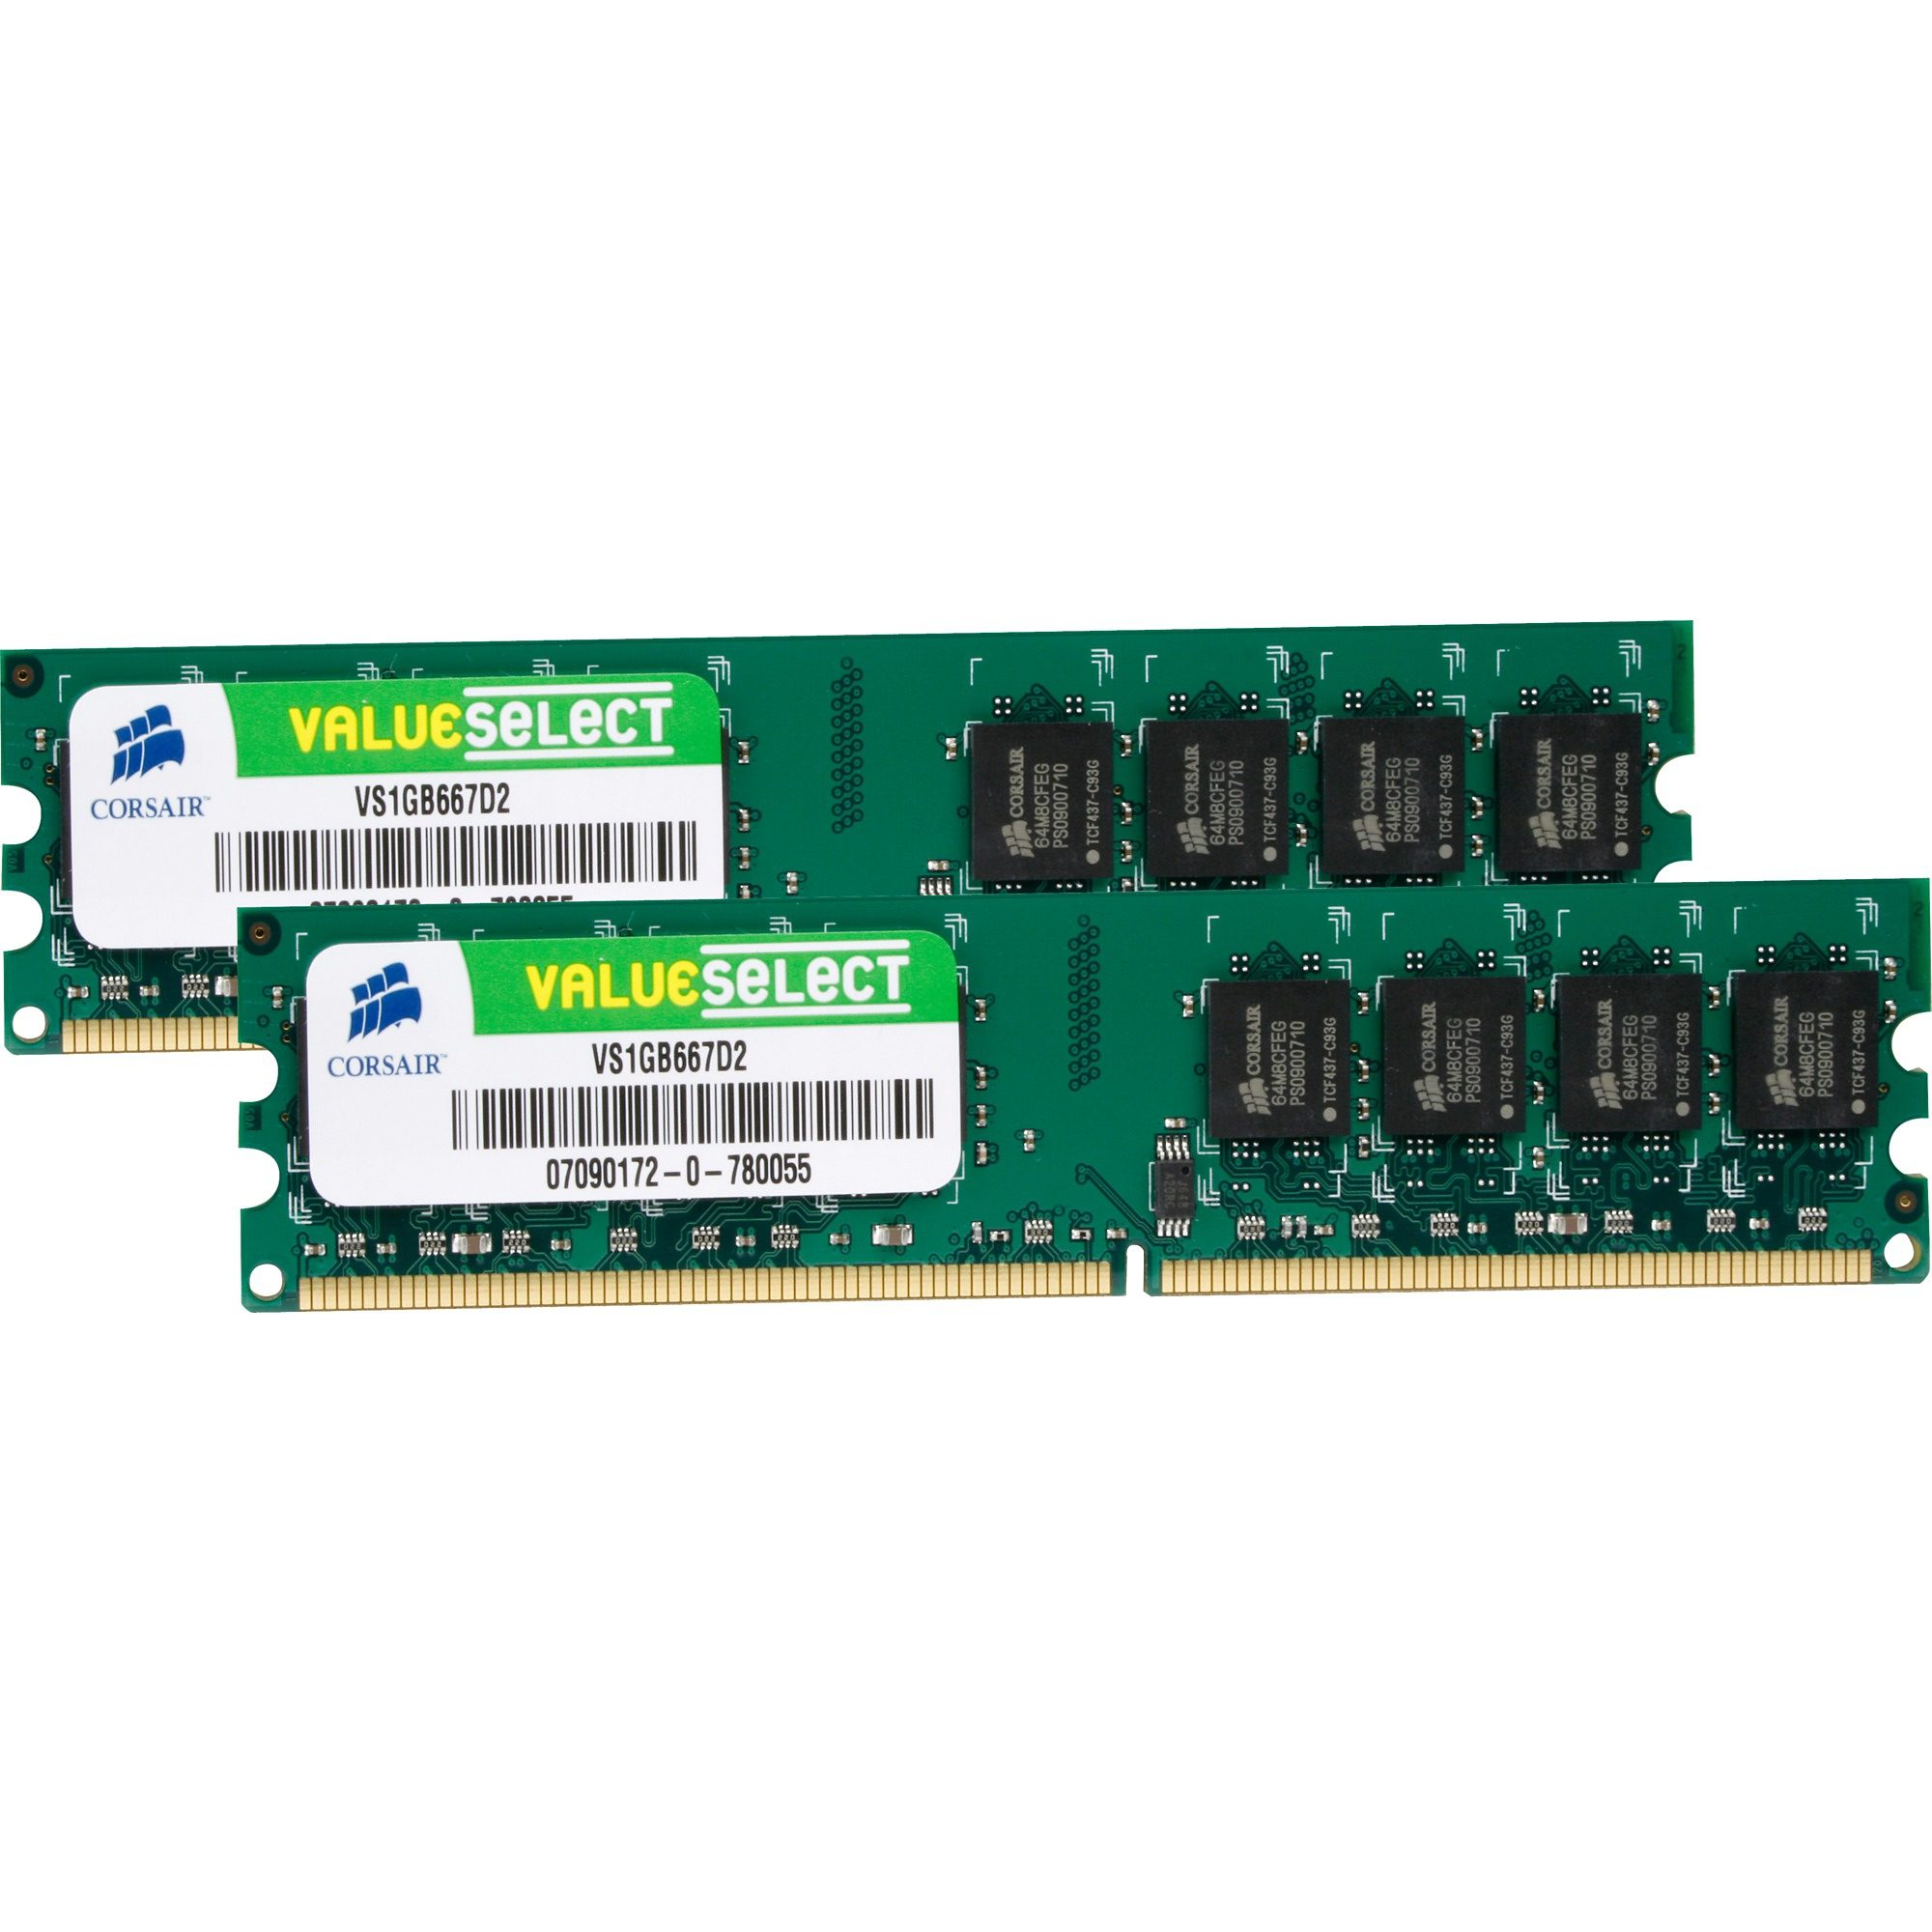 Corsair ValueSelect Arbeitsspeicher »DIMM 2 GB DDR2-667 Kit«